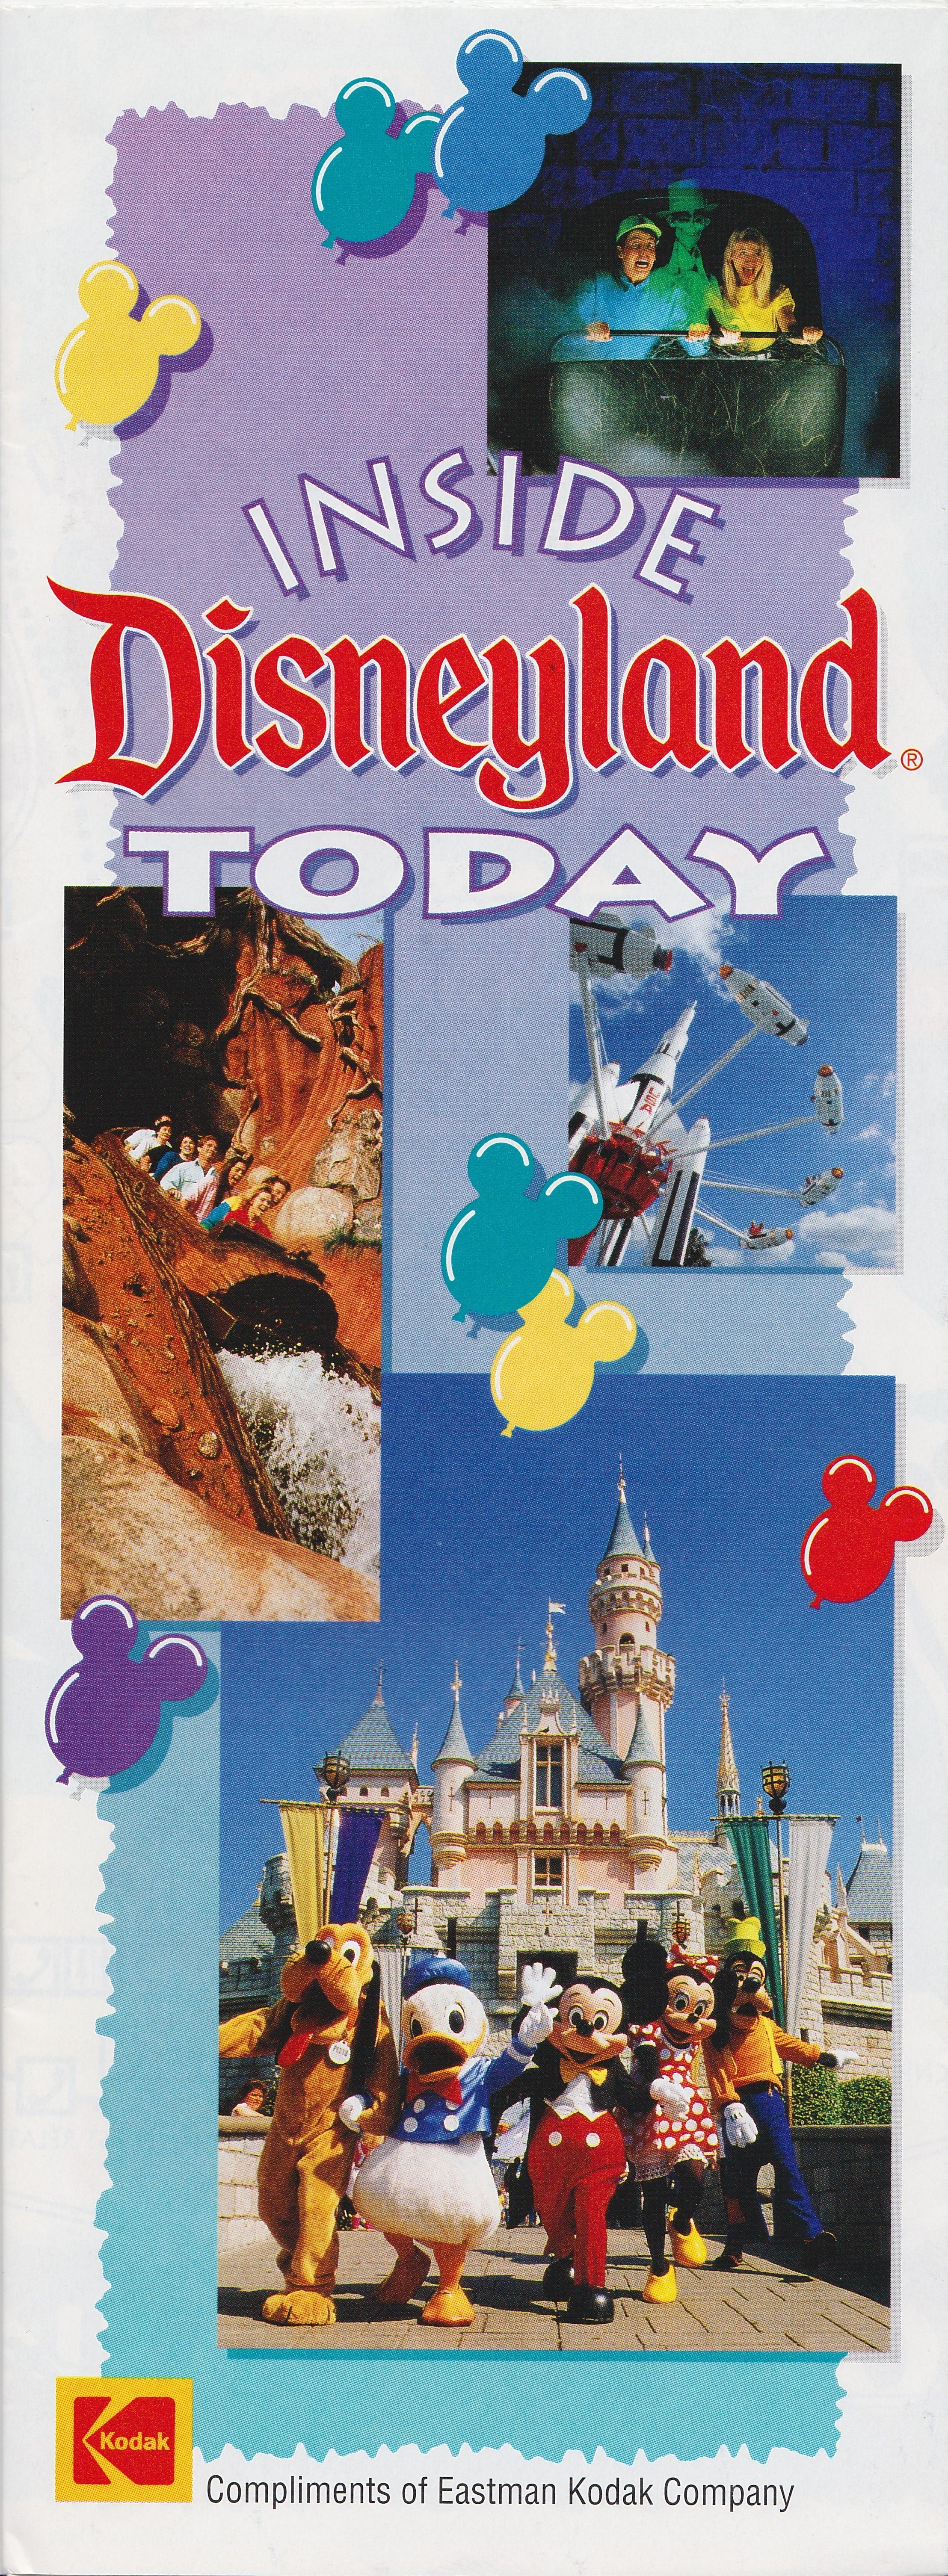 DL - 1995 - 02-27 - 03-03